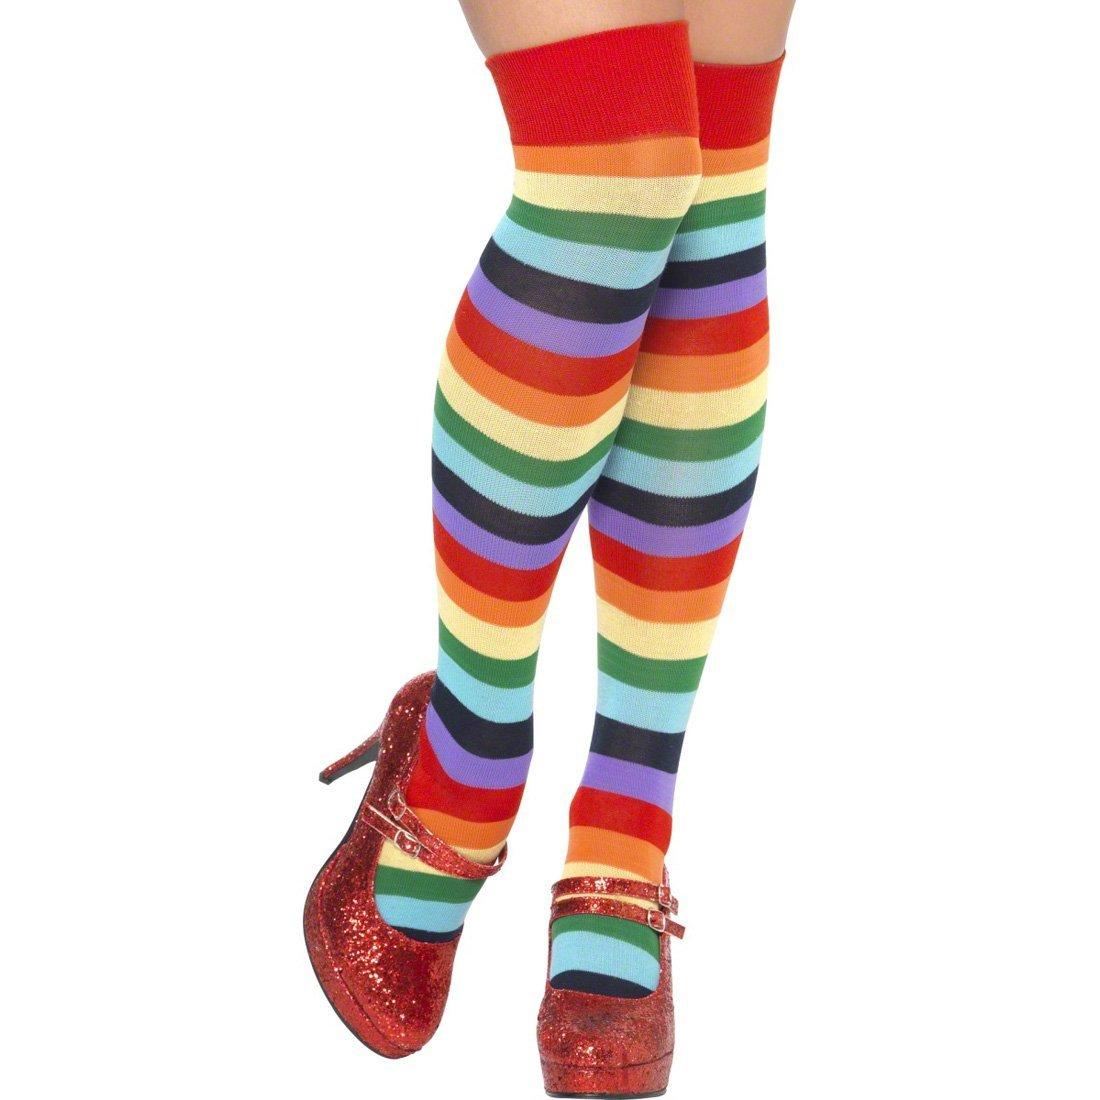 Regenbogen Kniestr/ümpfe Clown Str/ümpfe gestreift Ringelstr/ümpfe Overknees bunt Ringelkniestr/ümpfe Clownskost/üm Zubeh/ör